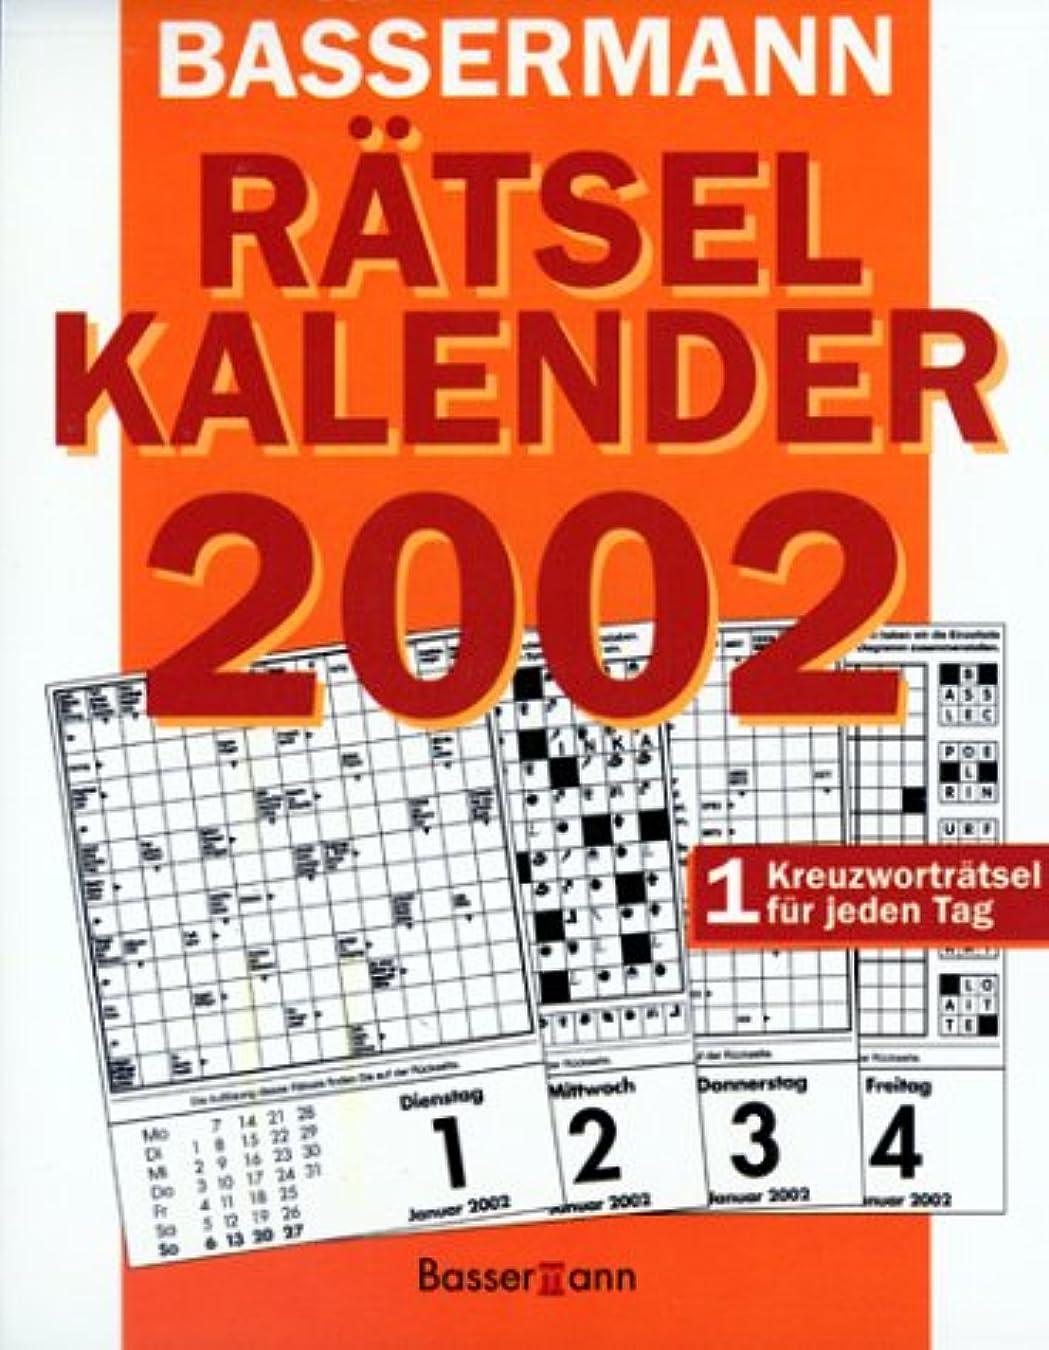 審判時代遅れ少しBassermann Raetsel- Kalender 2002. Abreiss- Kalender